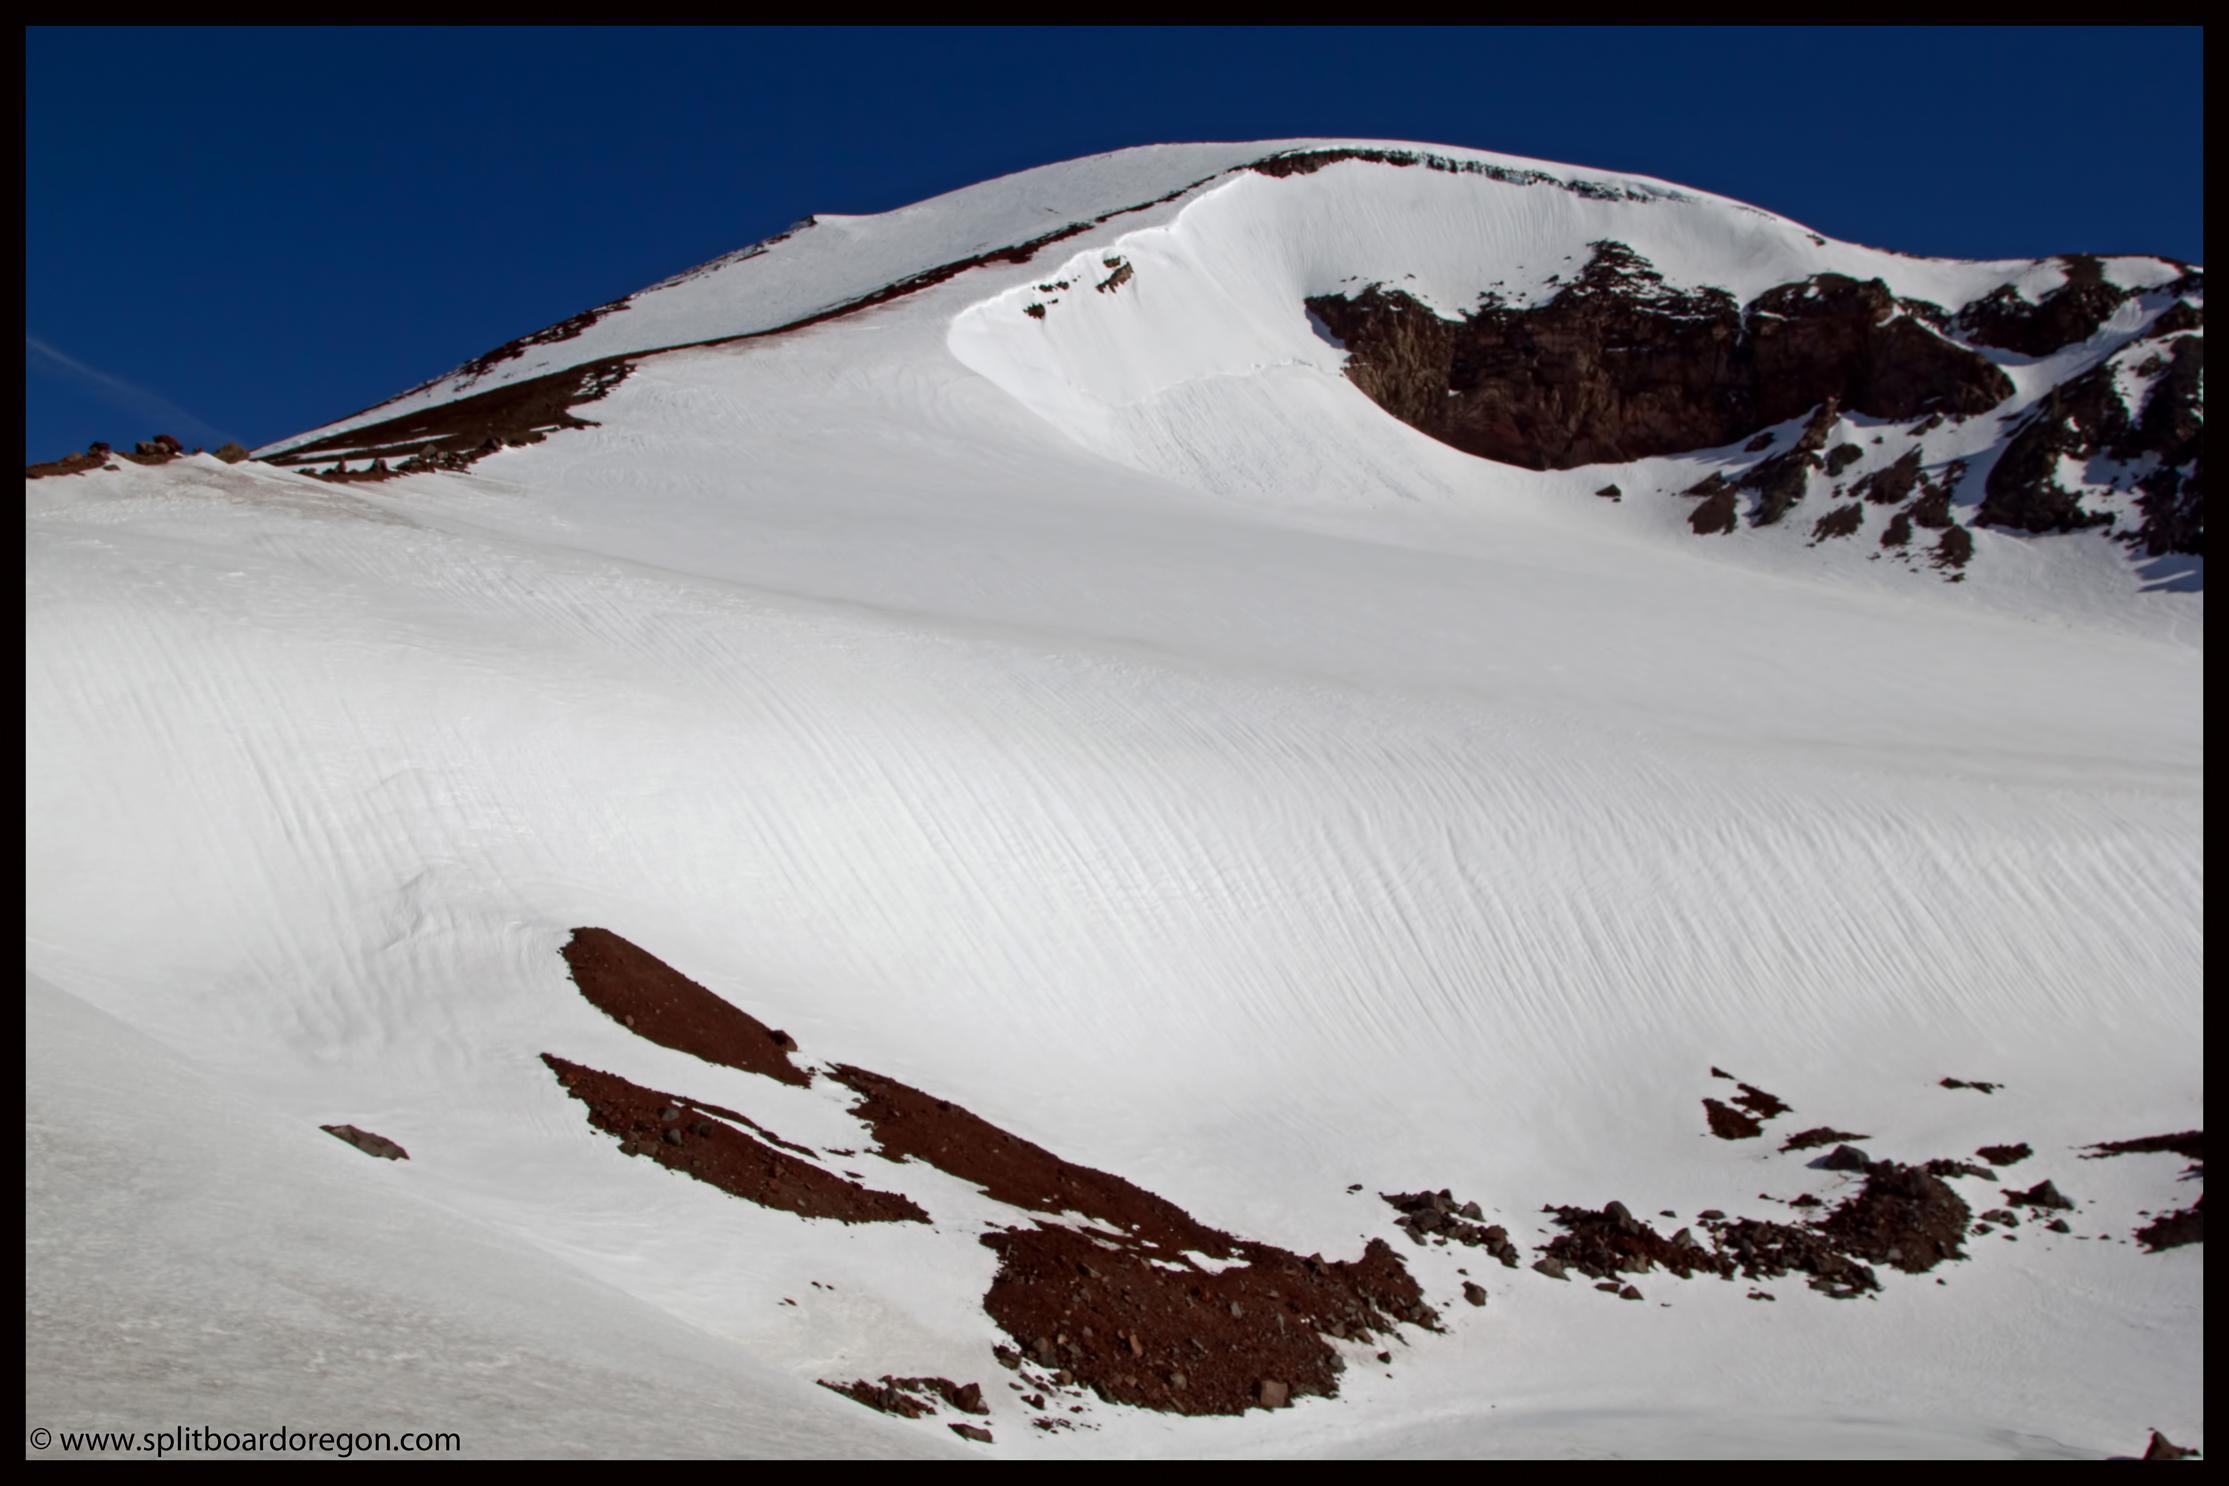 The Lewis Glacier